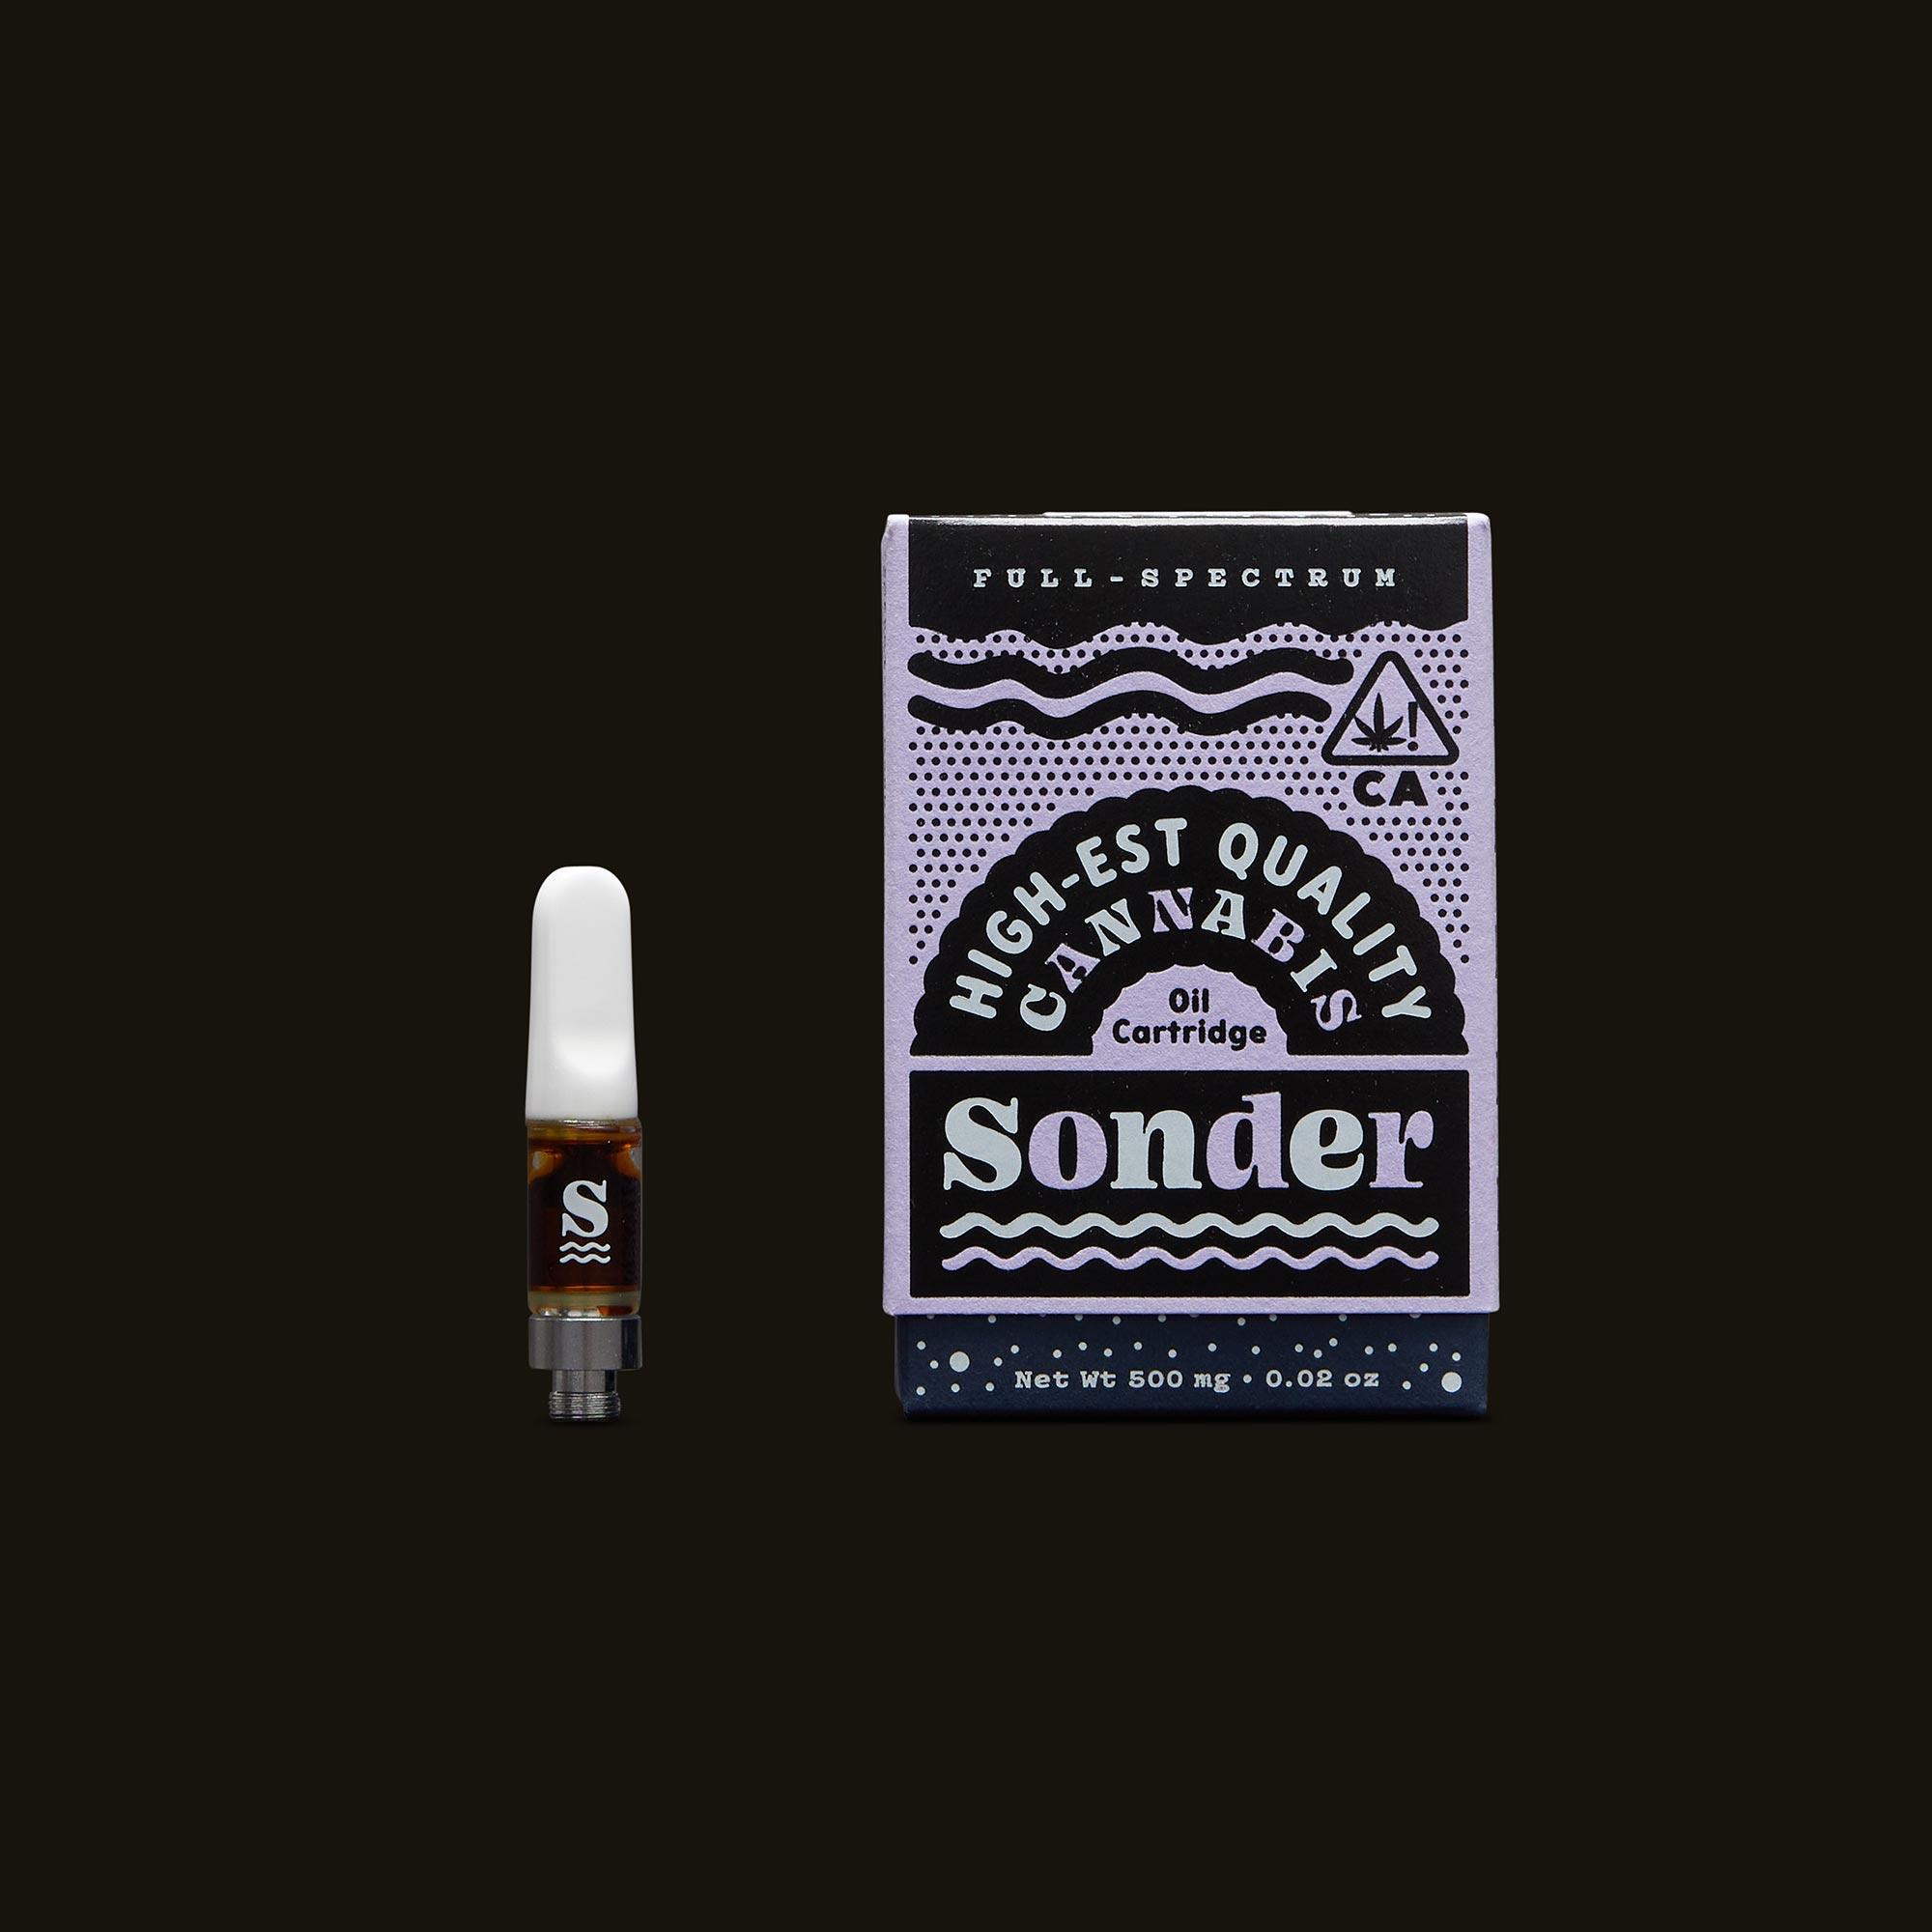 Sonder Gelato Glue Cartridge